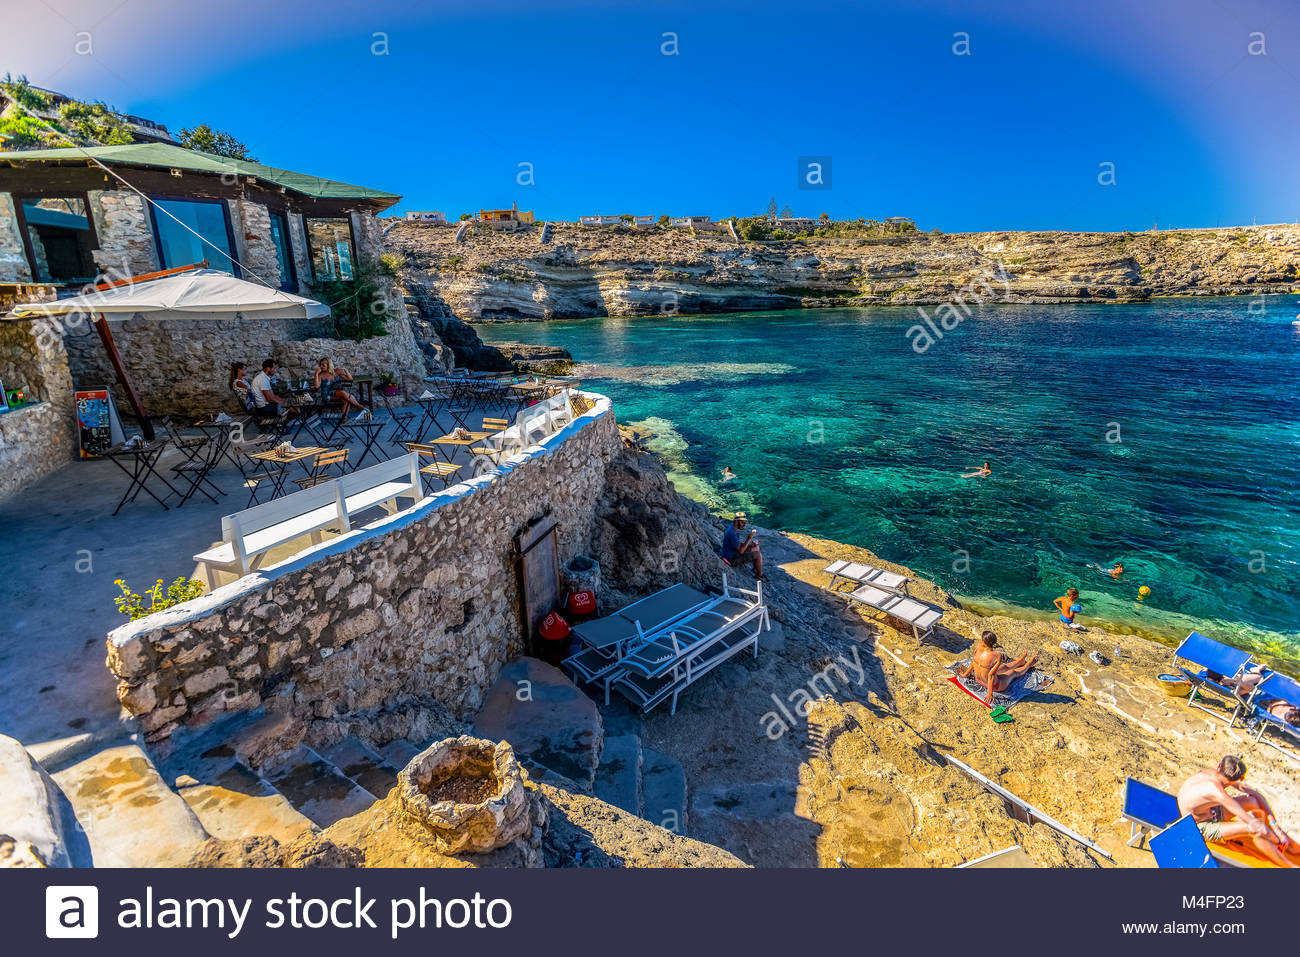 litalia-sicilia-isola-di-lampedusa-cala-creta-m4fp23